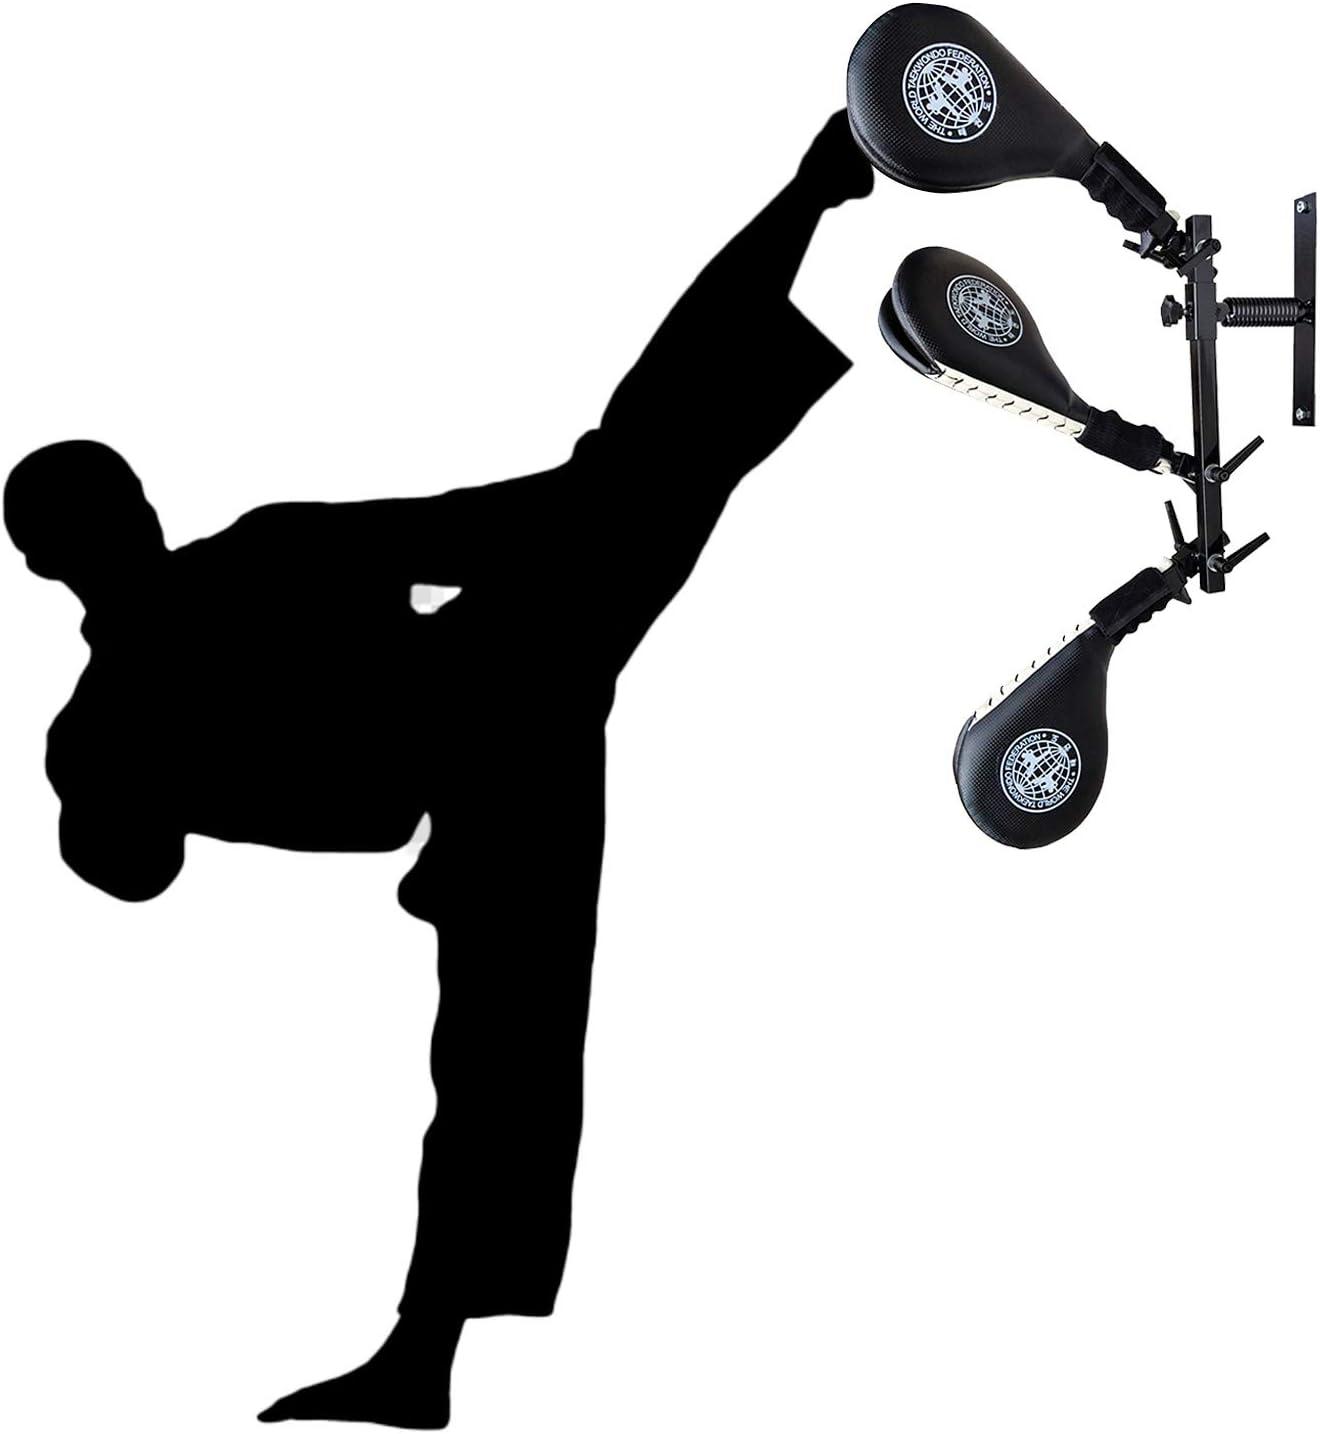 Details about  /Set of 3 Durable Taekwondo Kick Pads Targets for Kickboxing Training